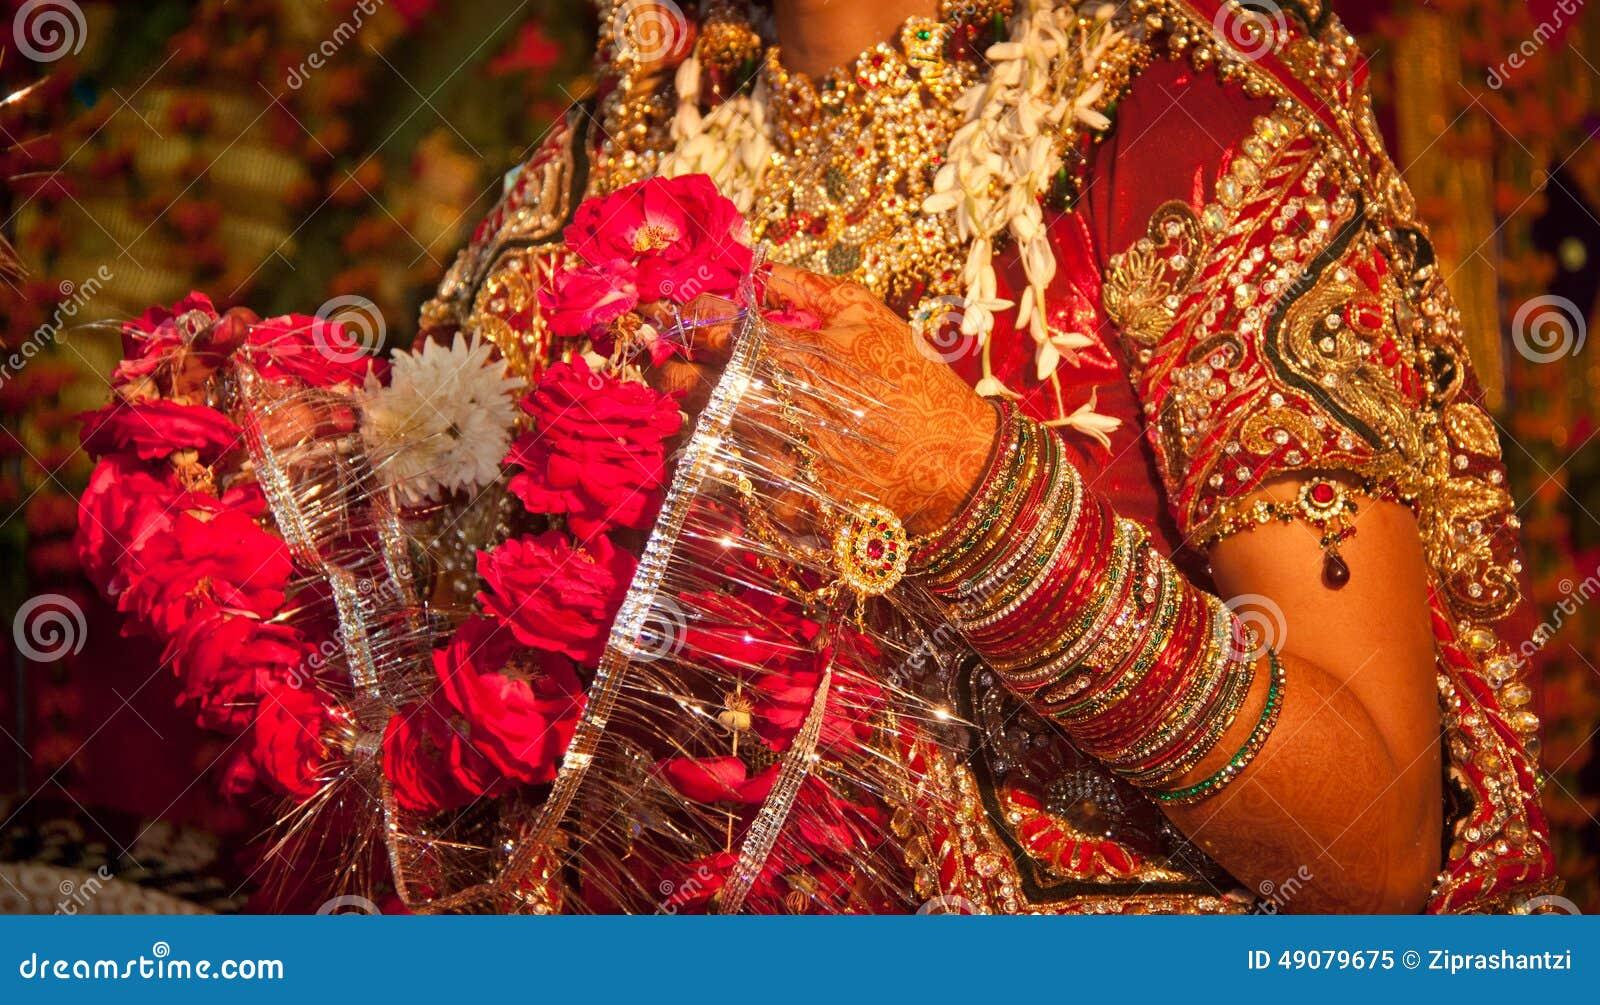 hindu wedding ritual in india stock image image of auspicious